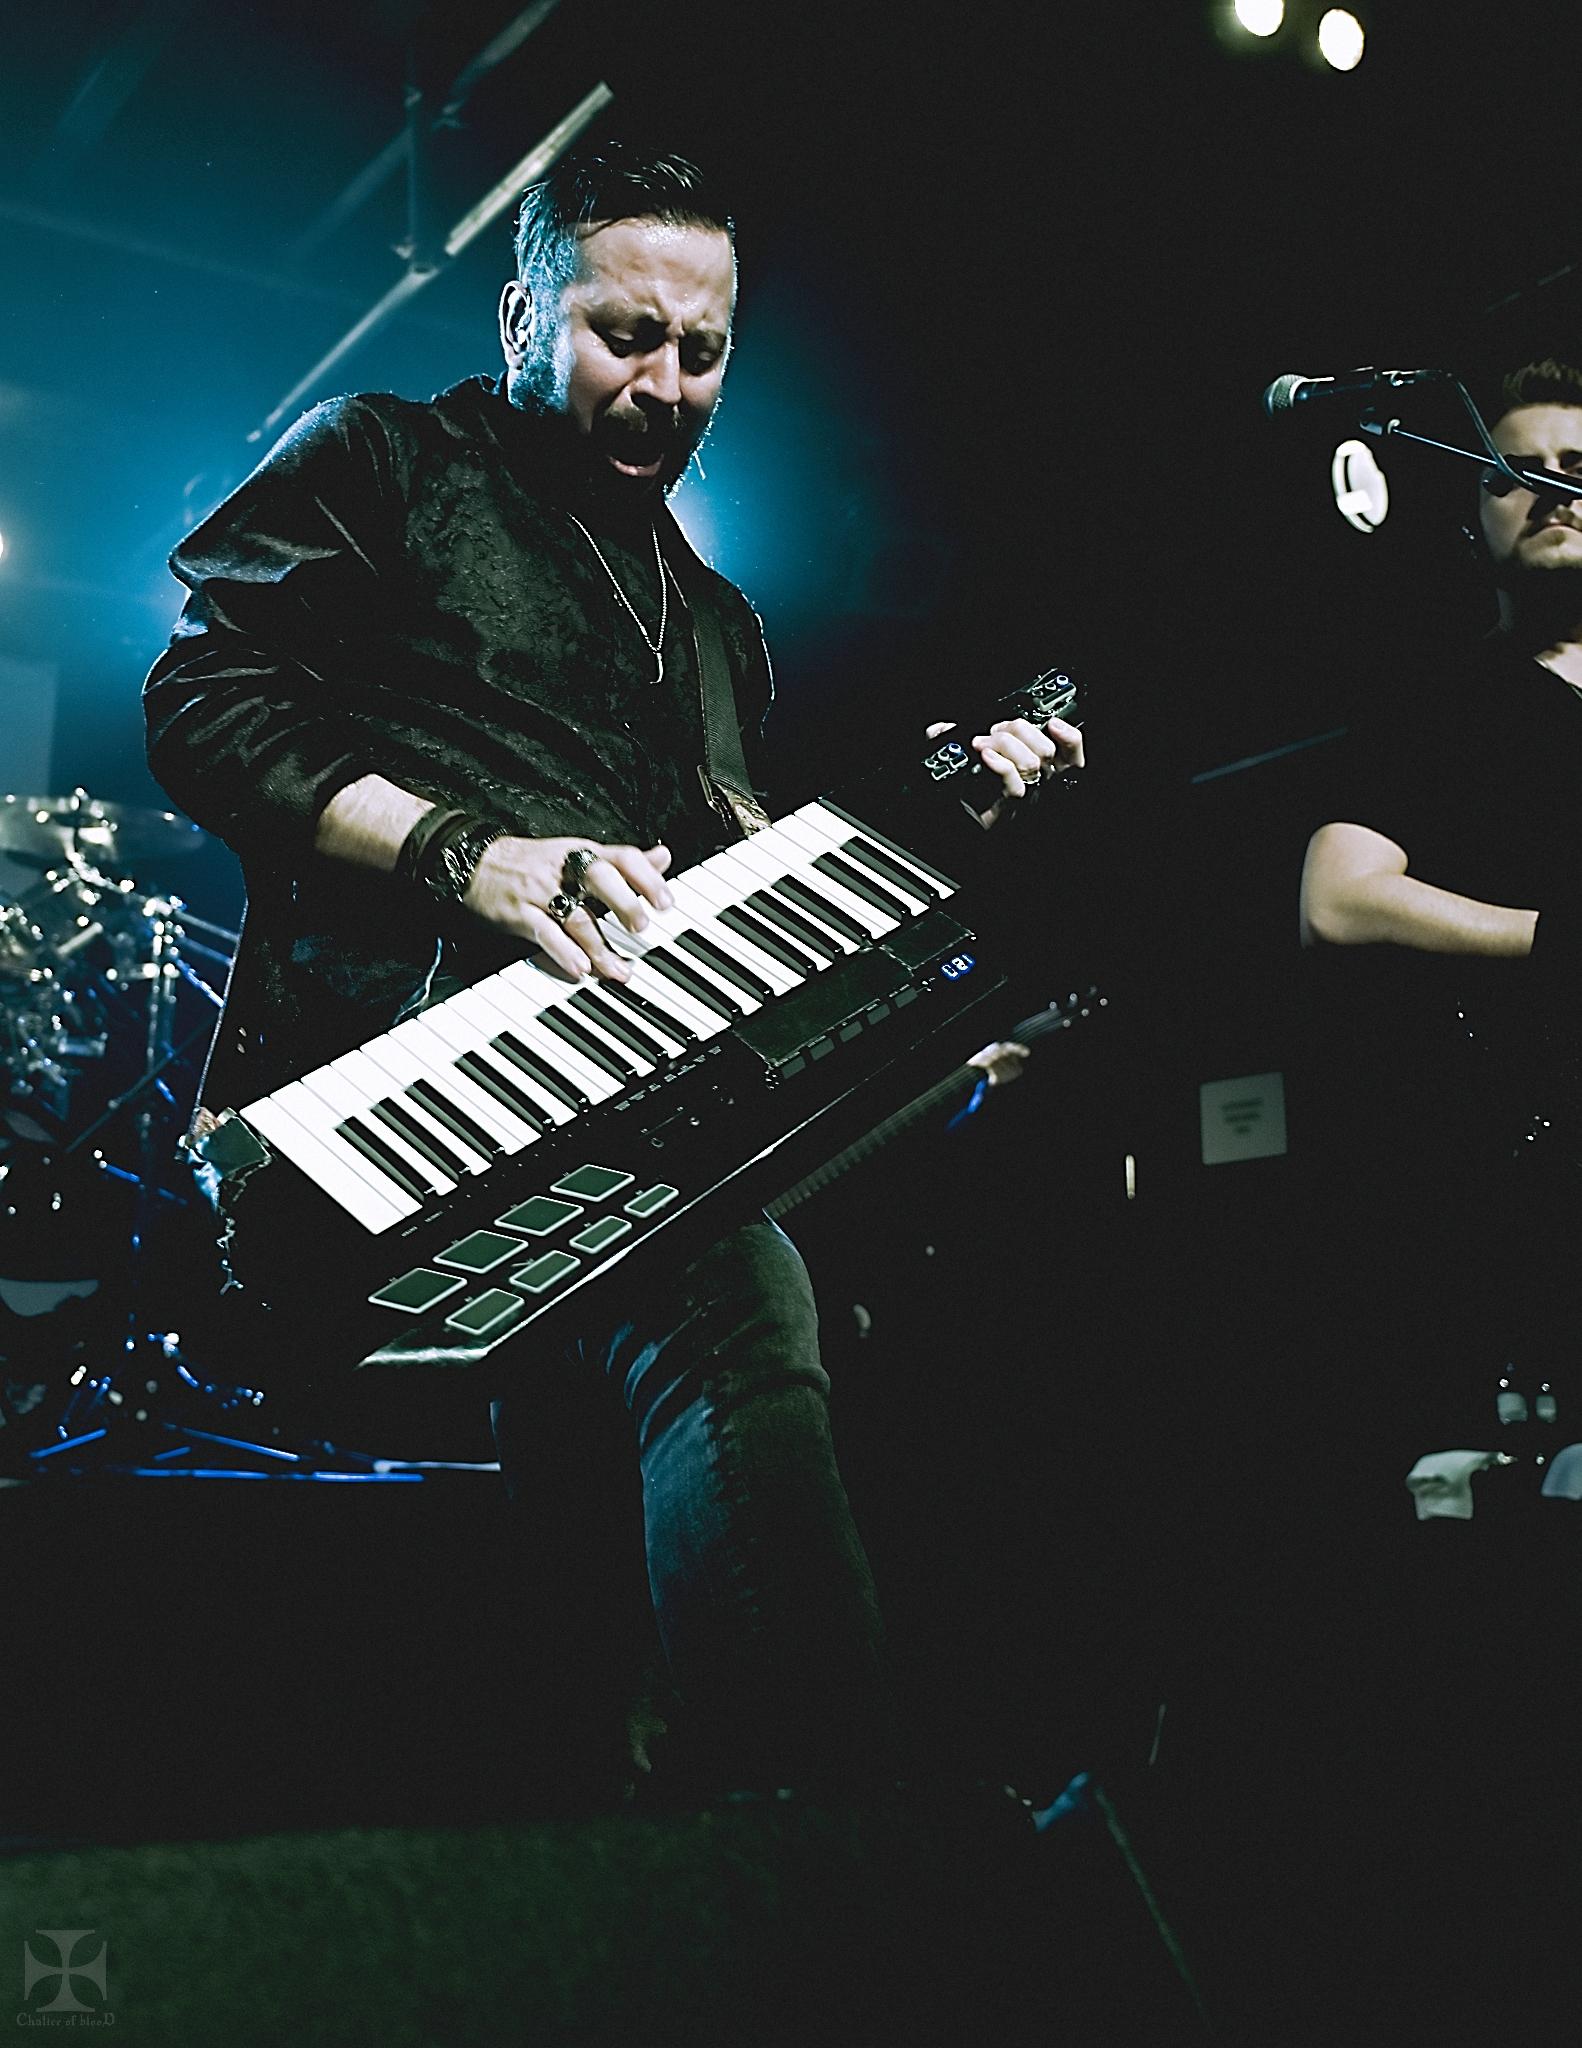 2017.11 Mike Portnoy - 231-Exposure.jpg